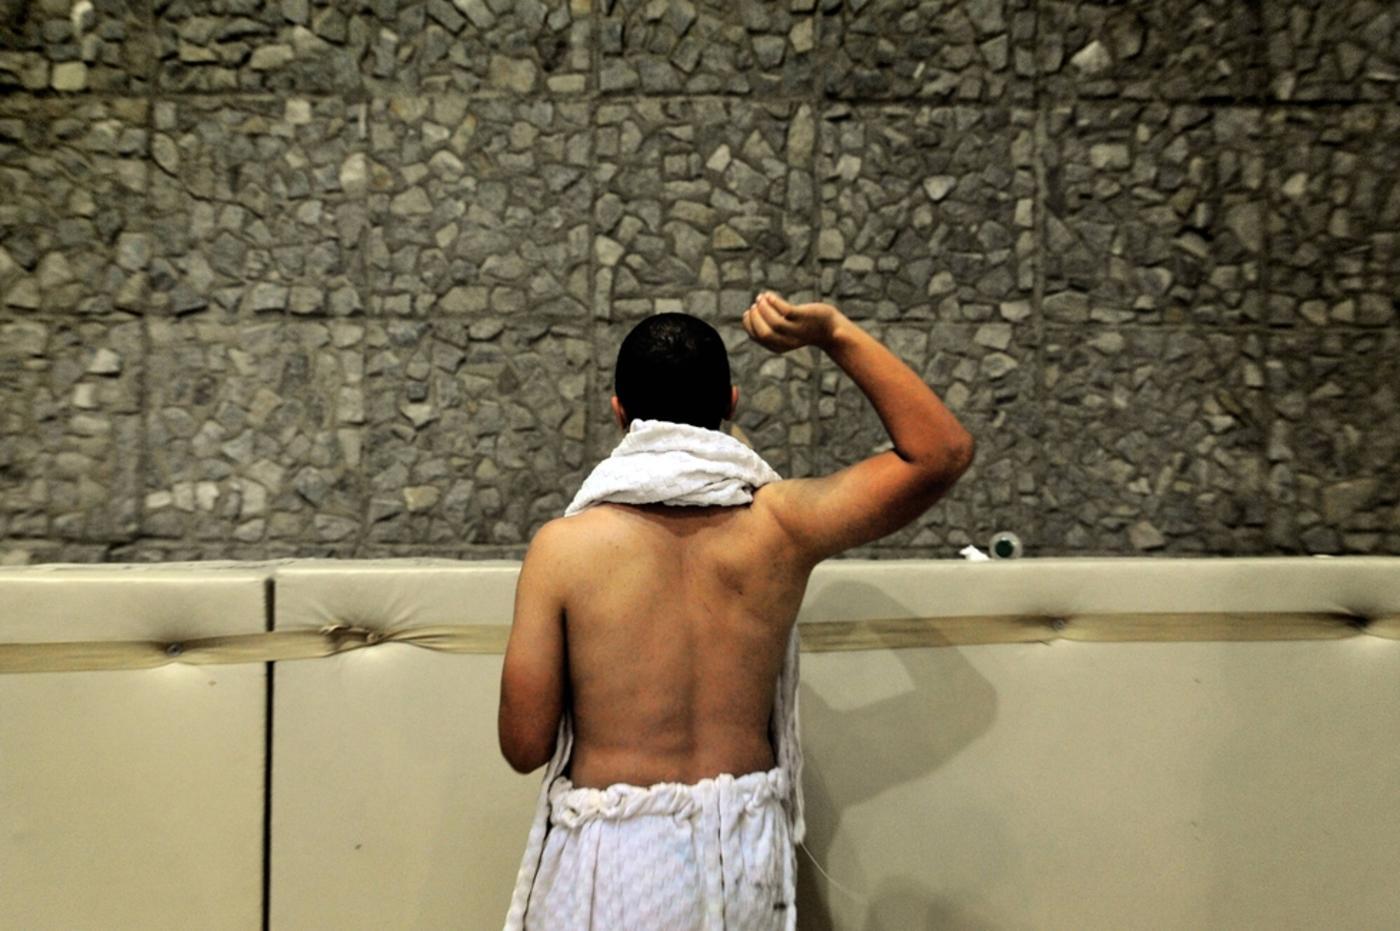 EXCLUSIVE: Saudi Arabia bars Palestinian refugees in Lebanon